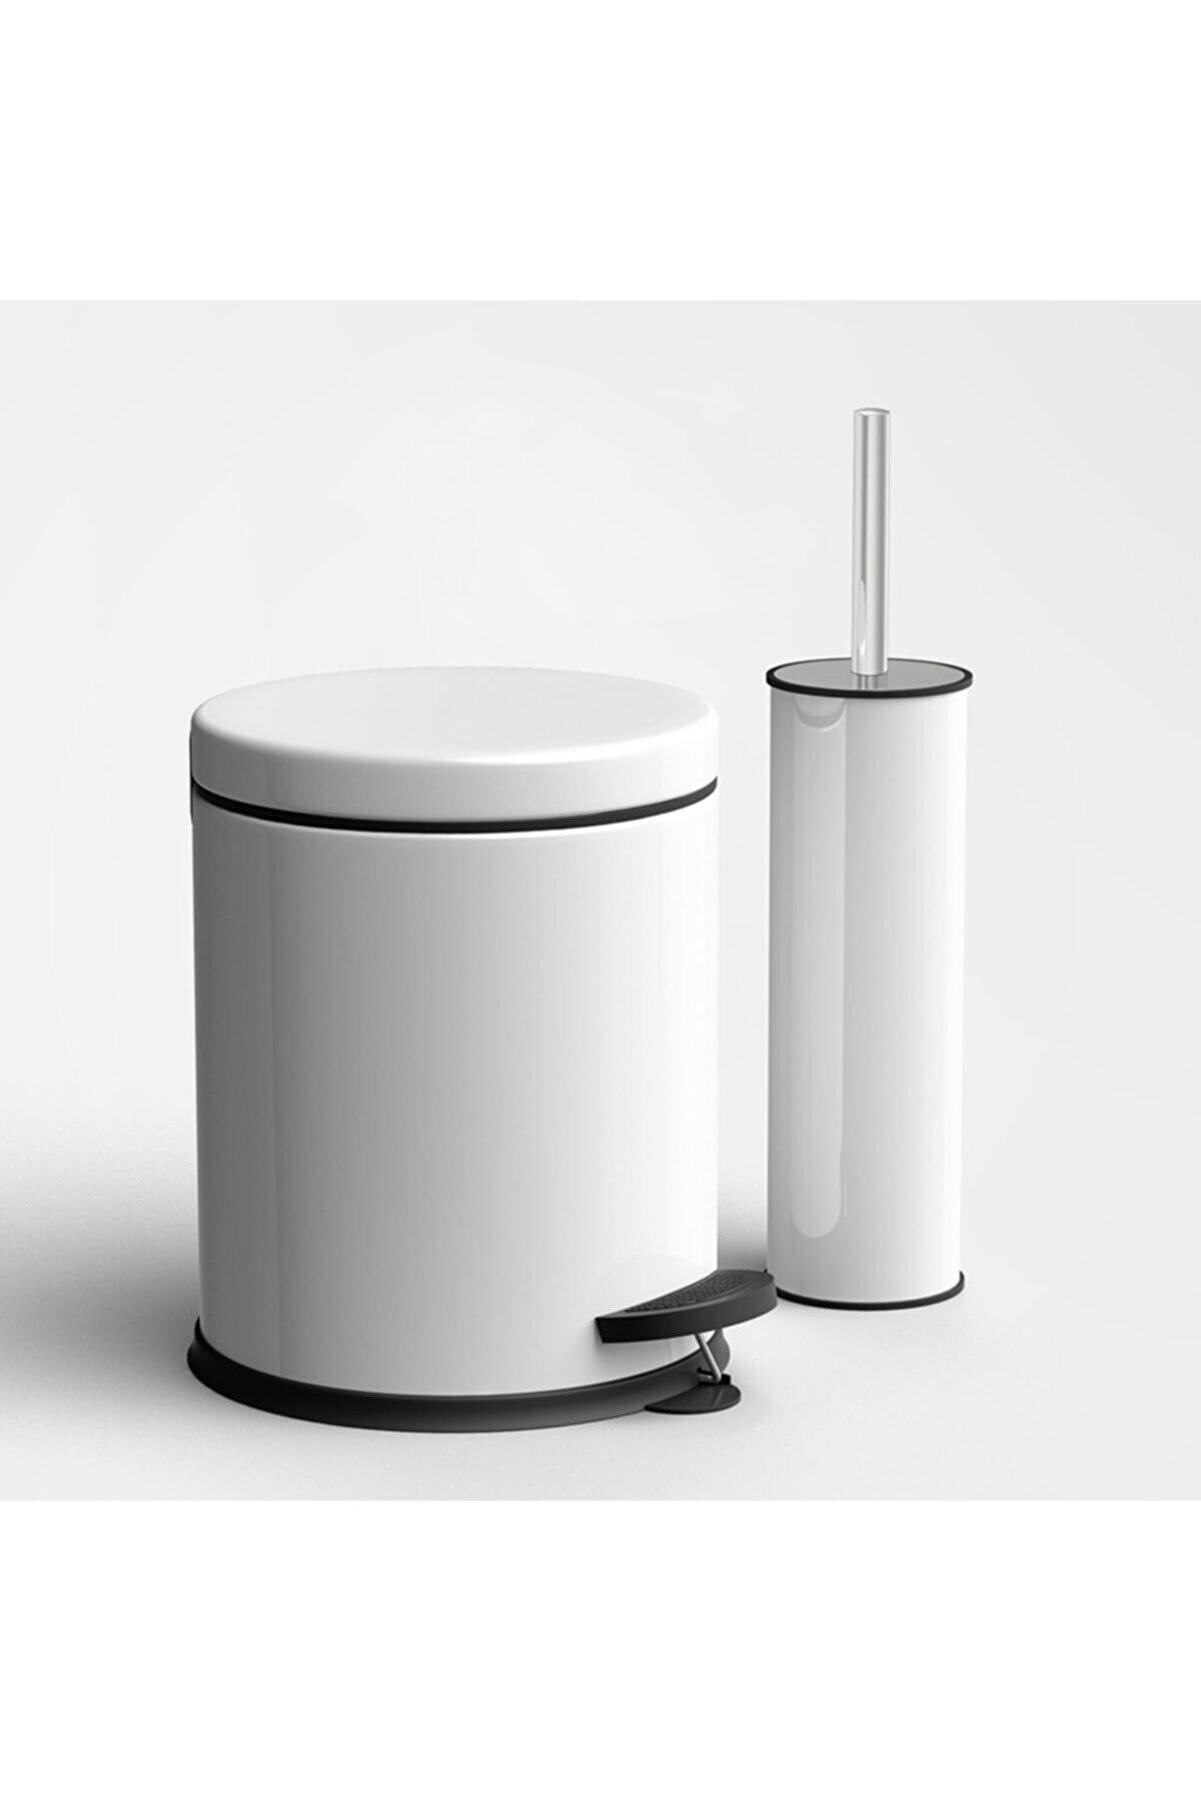 Fevito Beyaz 3 Litre 2'li Banyo Seti Pedallı Çöp Kovası Wc Klozet Tuvalet Fırça Seti Banyo Çöp Kovası